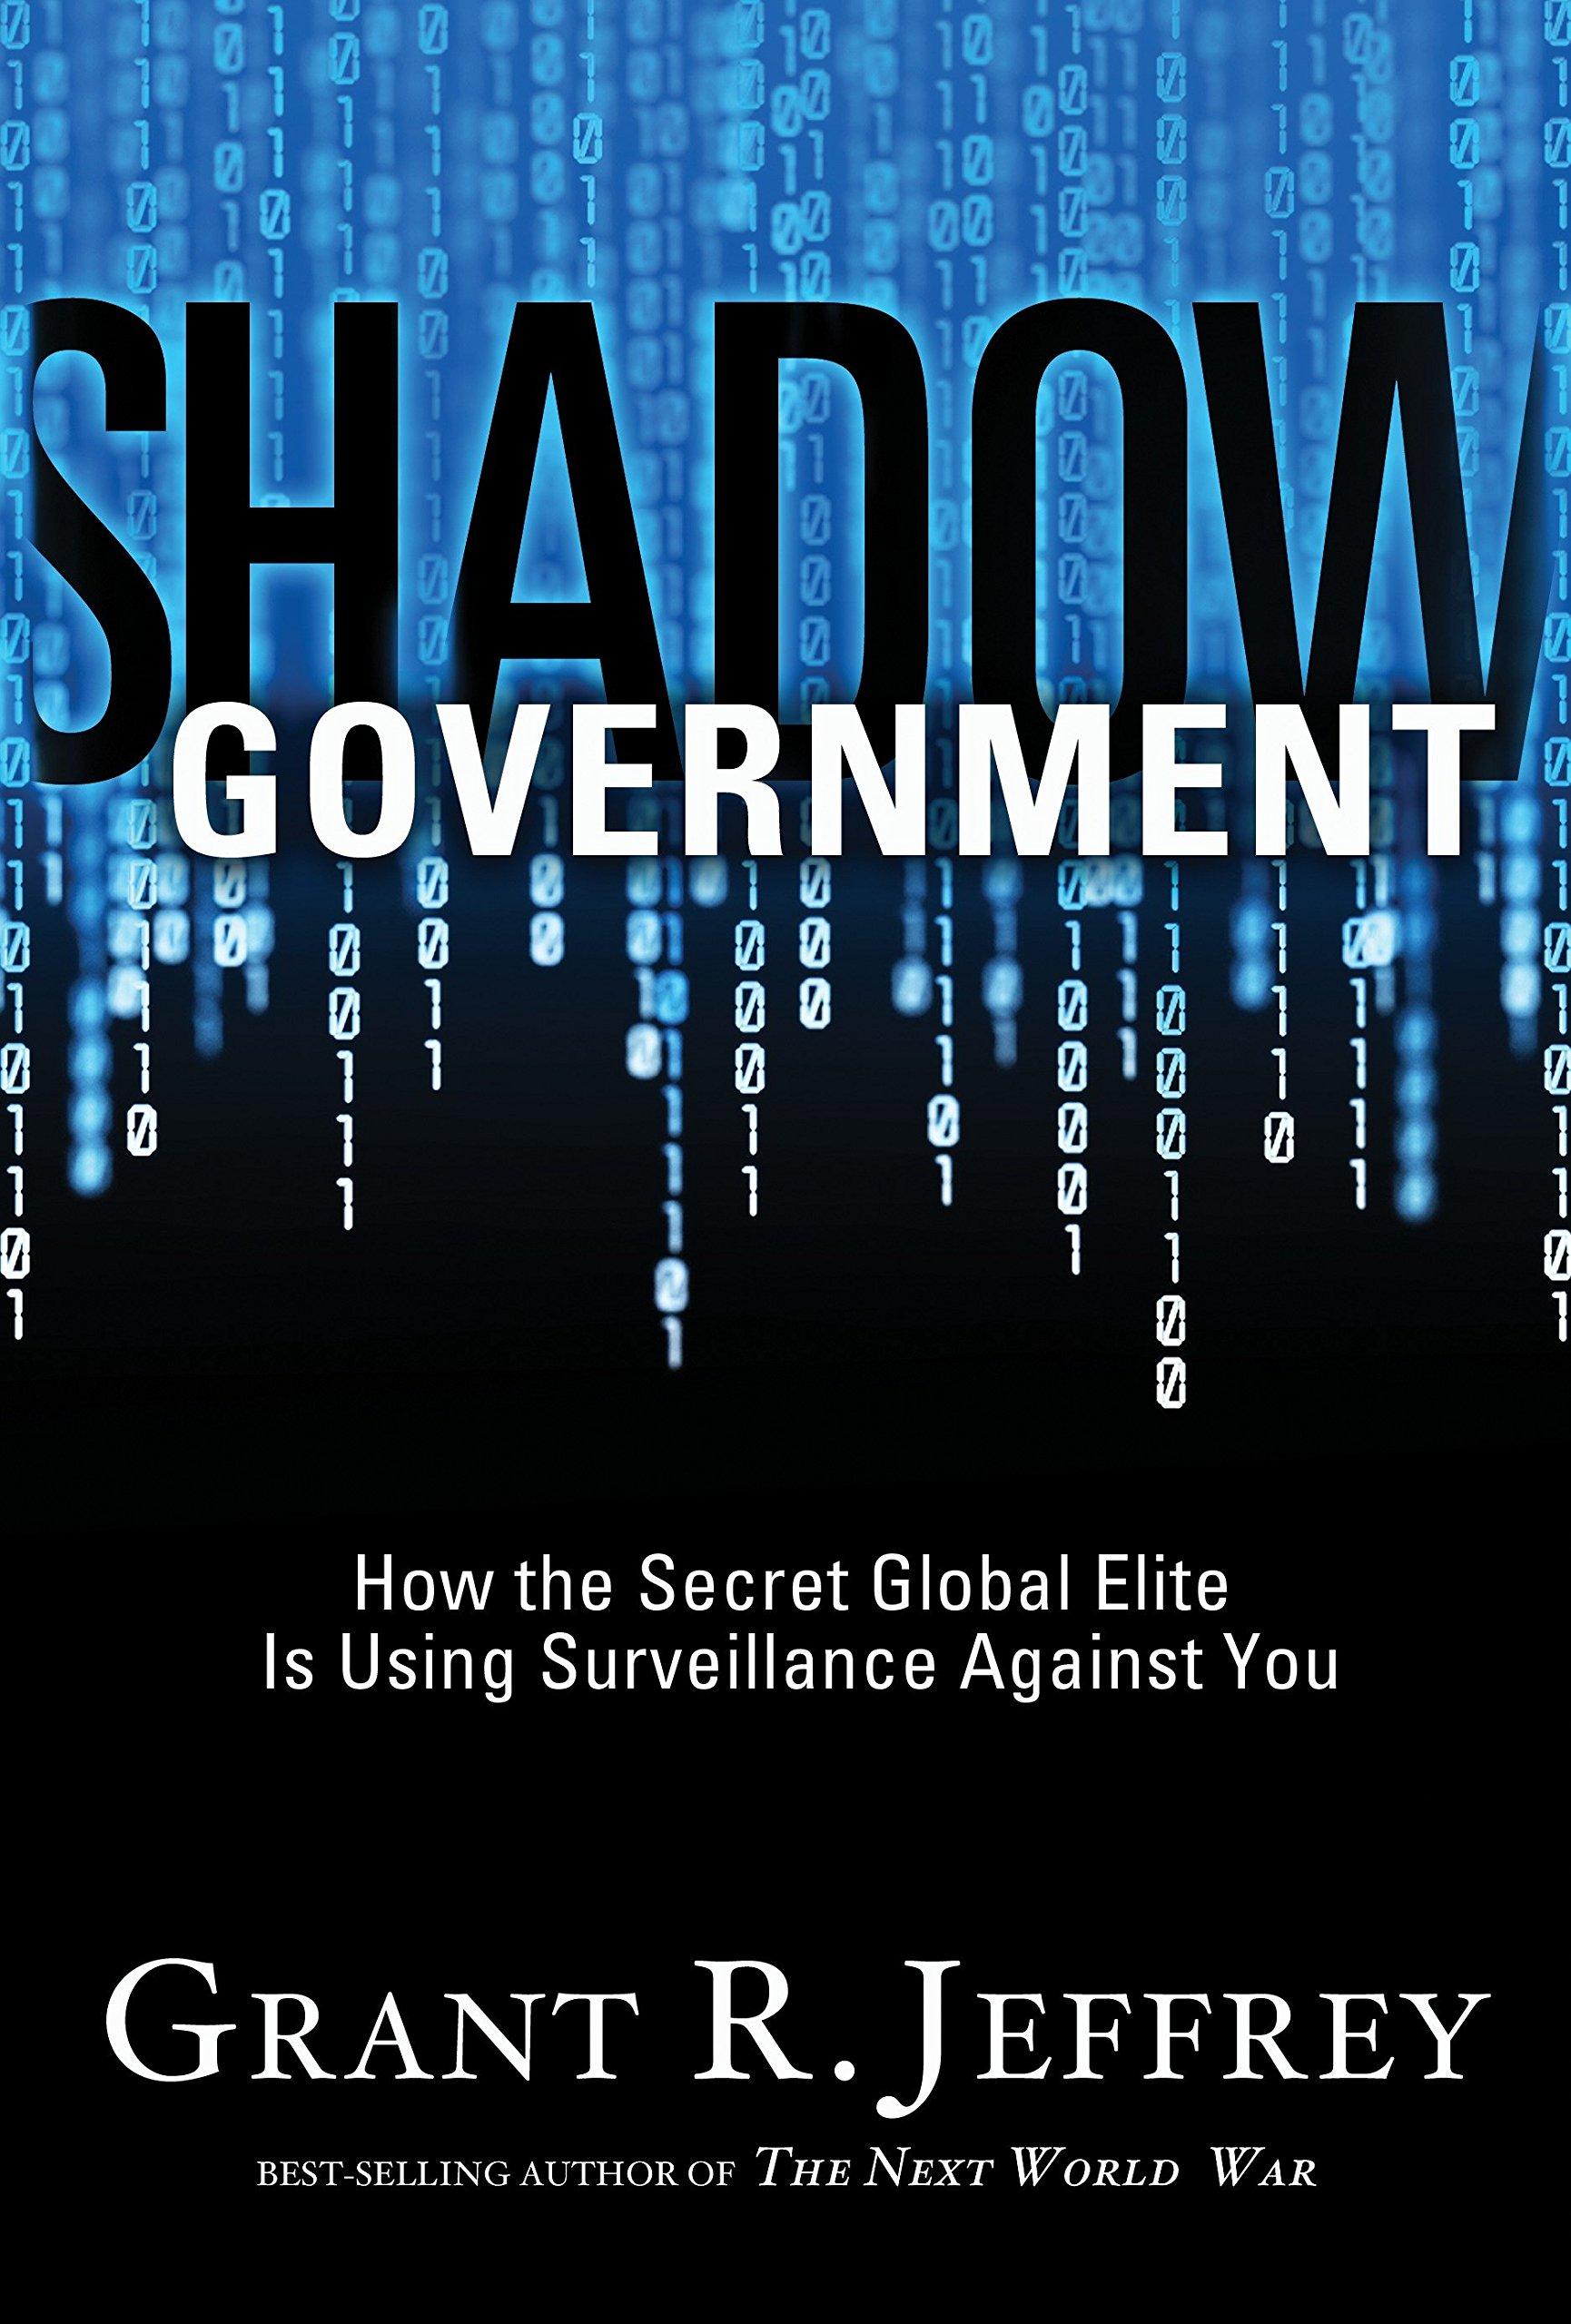 SHADOW GOVERNMENT GRANT JEFFREY EPUB